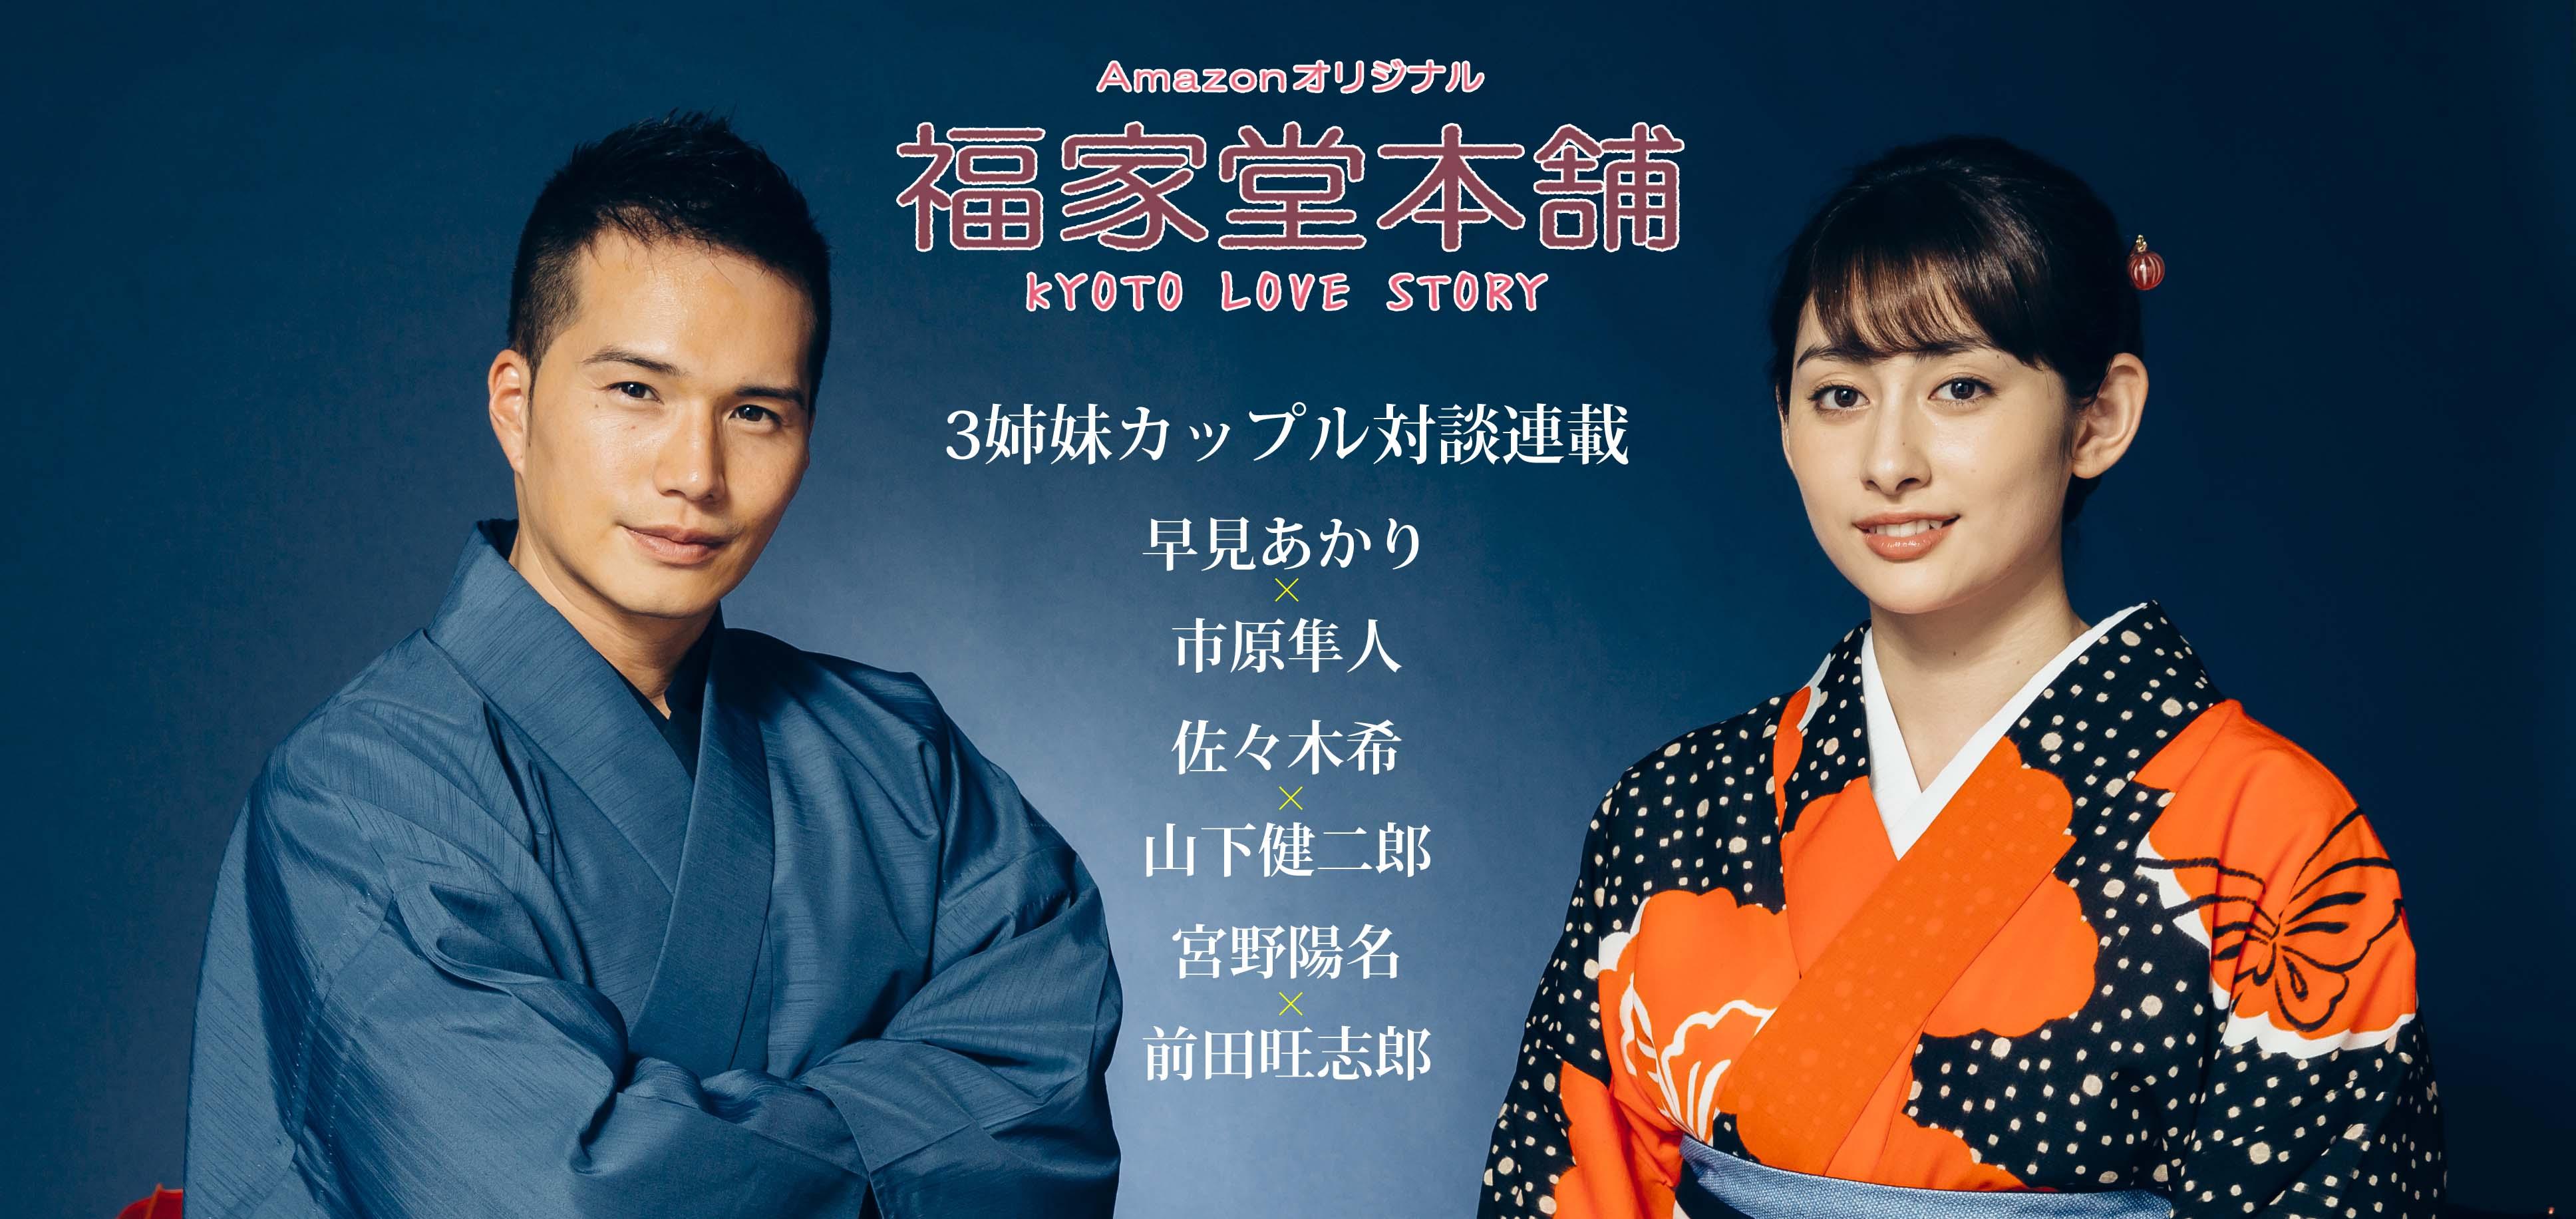 Amazonオリジナル「福家堂本舗-KYOTO LOVE STORY-」カップル対談リレー連載